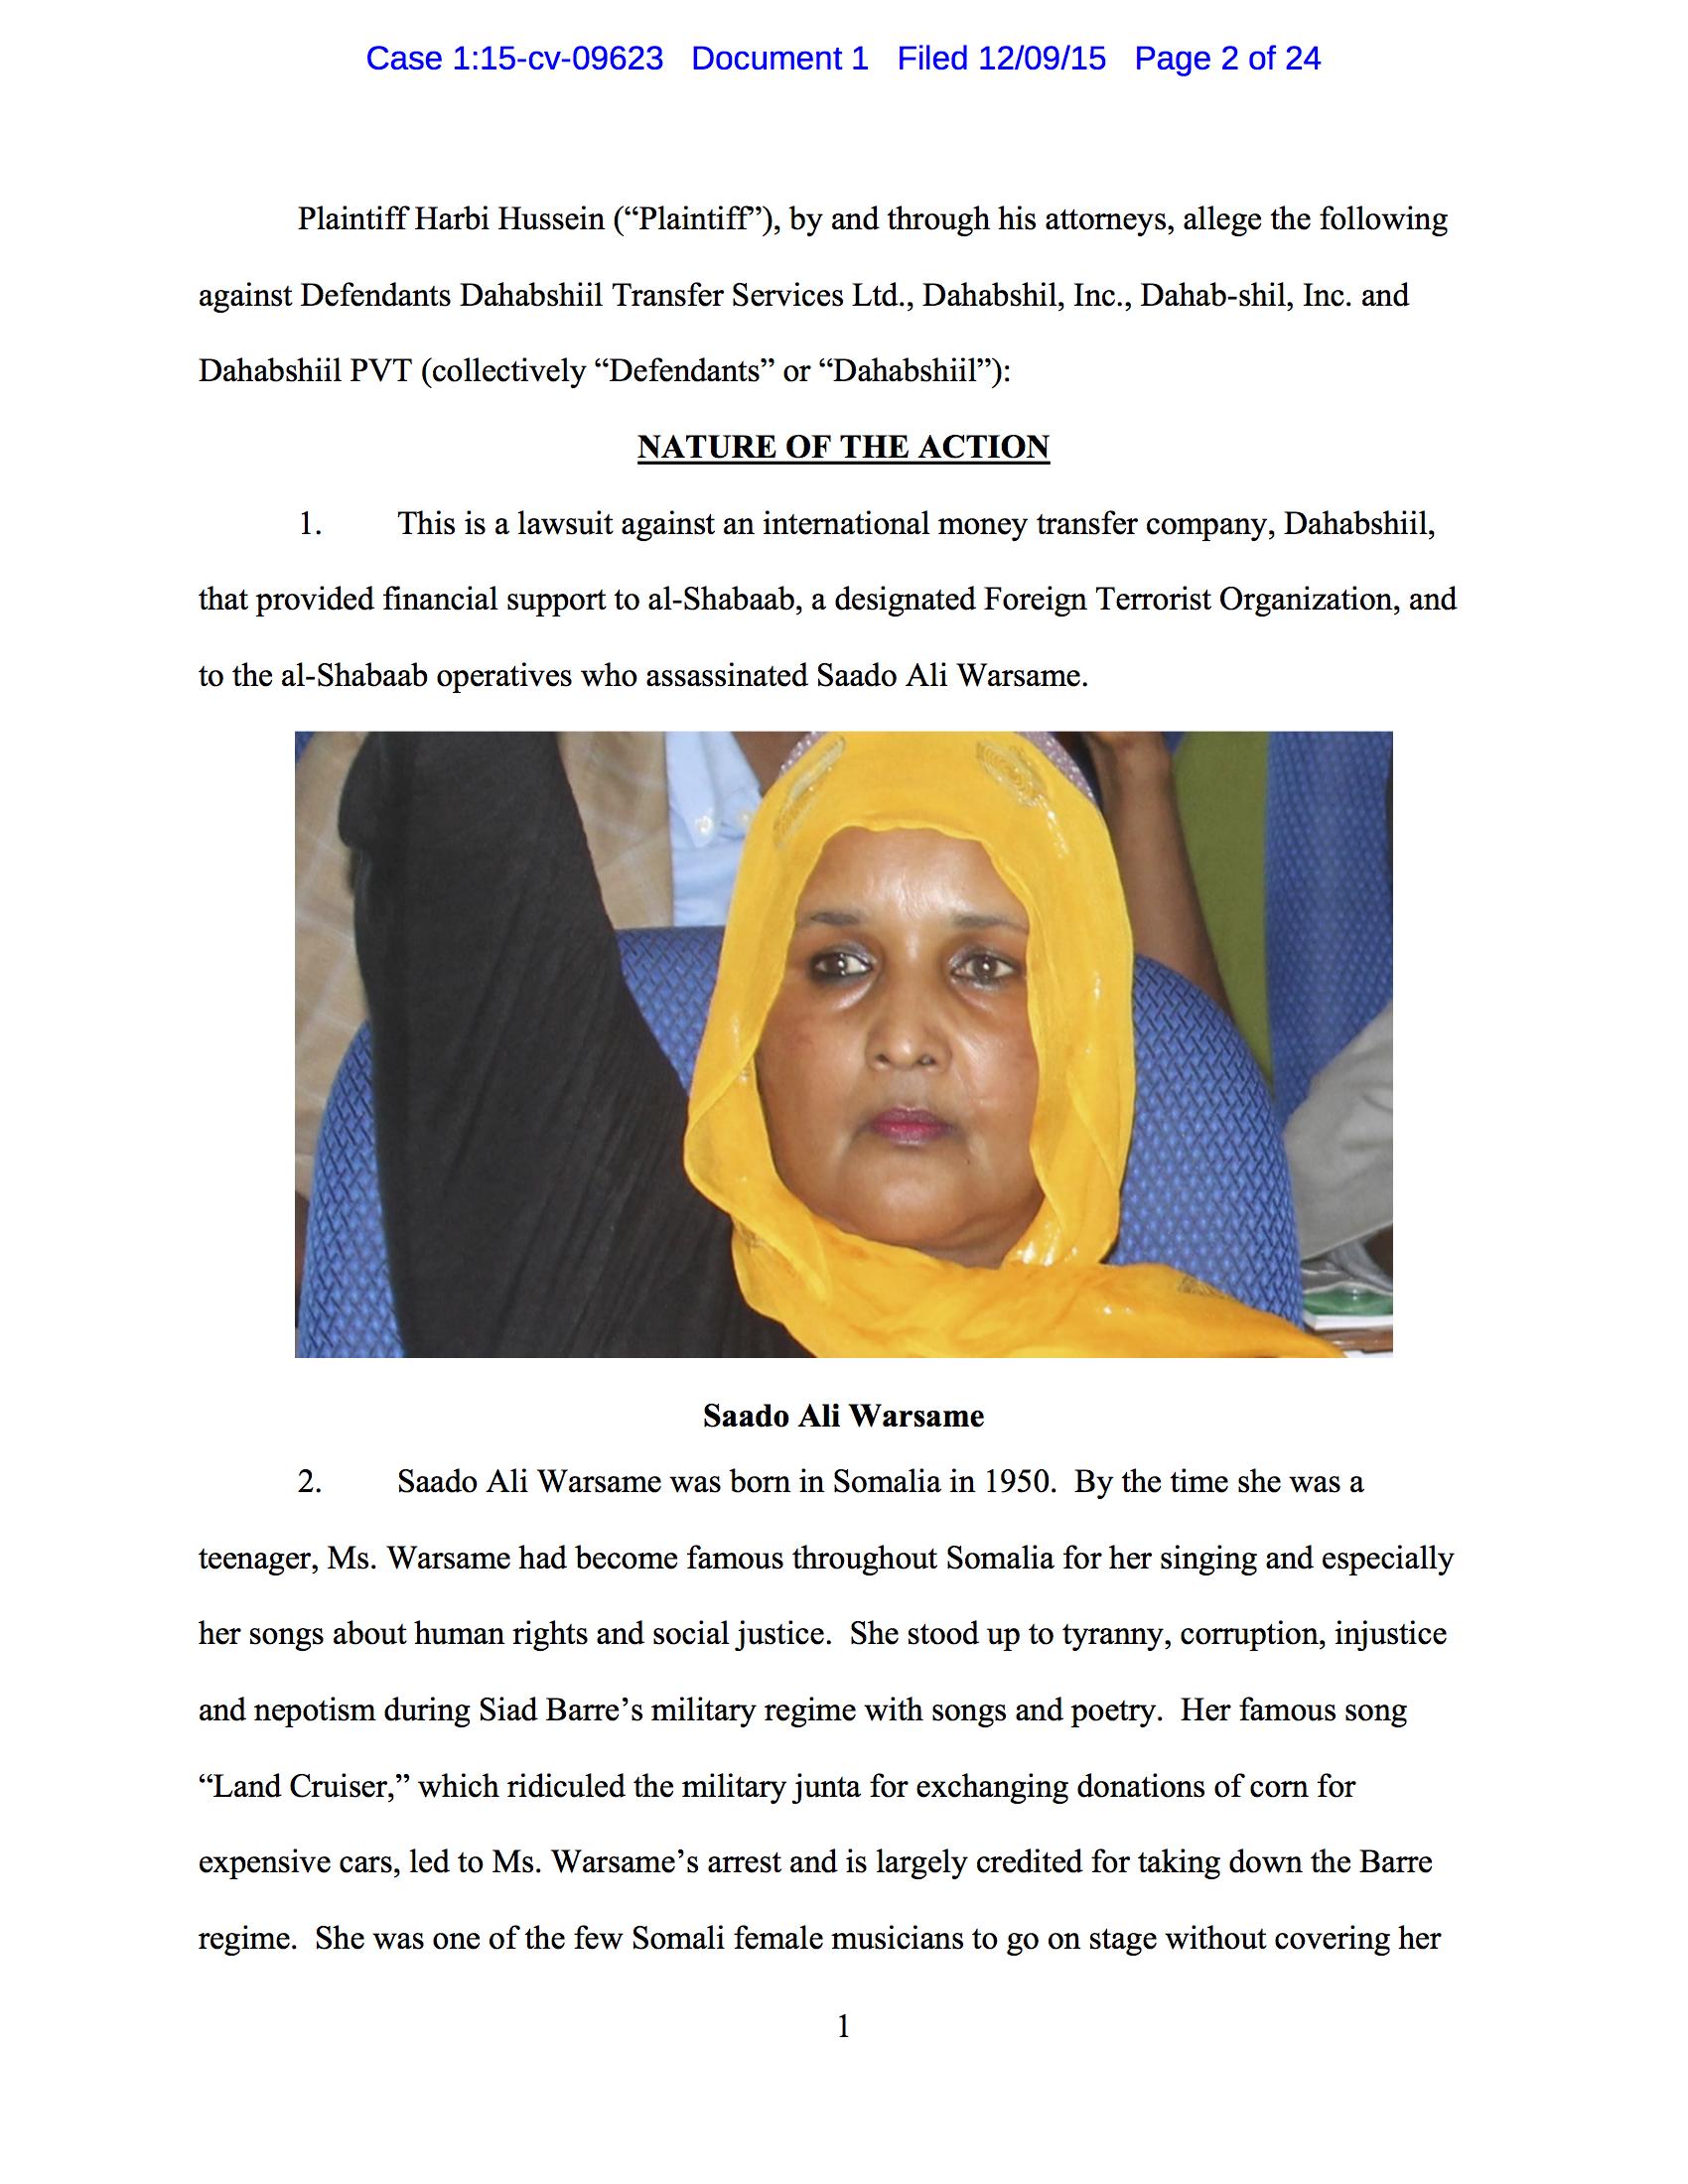 Slain Somali Icon's Son Targets Terror Funds Dahabshiil.